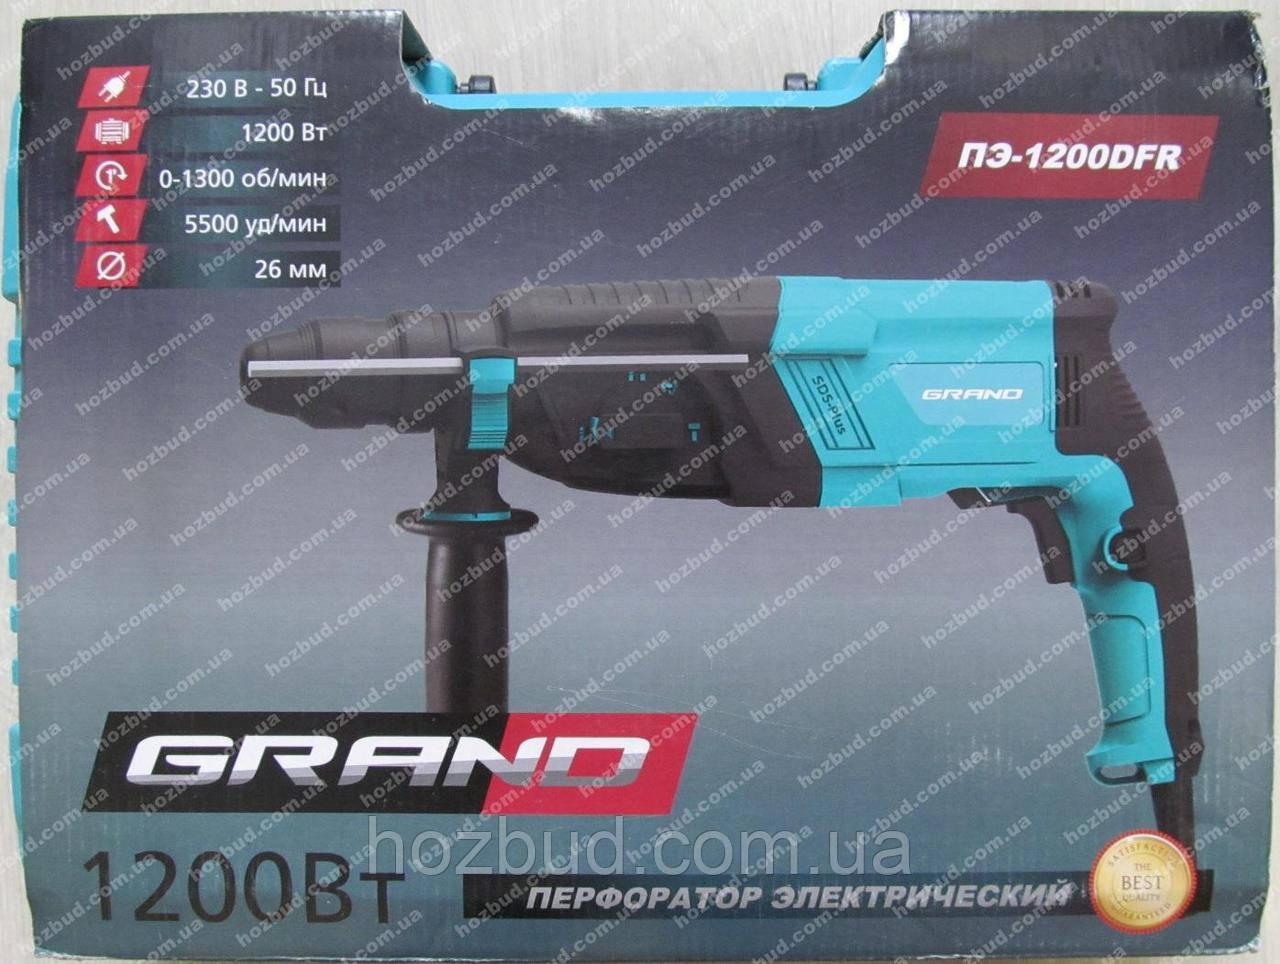 Перфоратор Grand ПЭ-1200 DFR